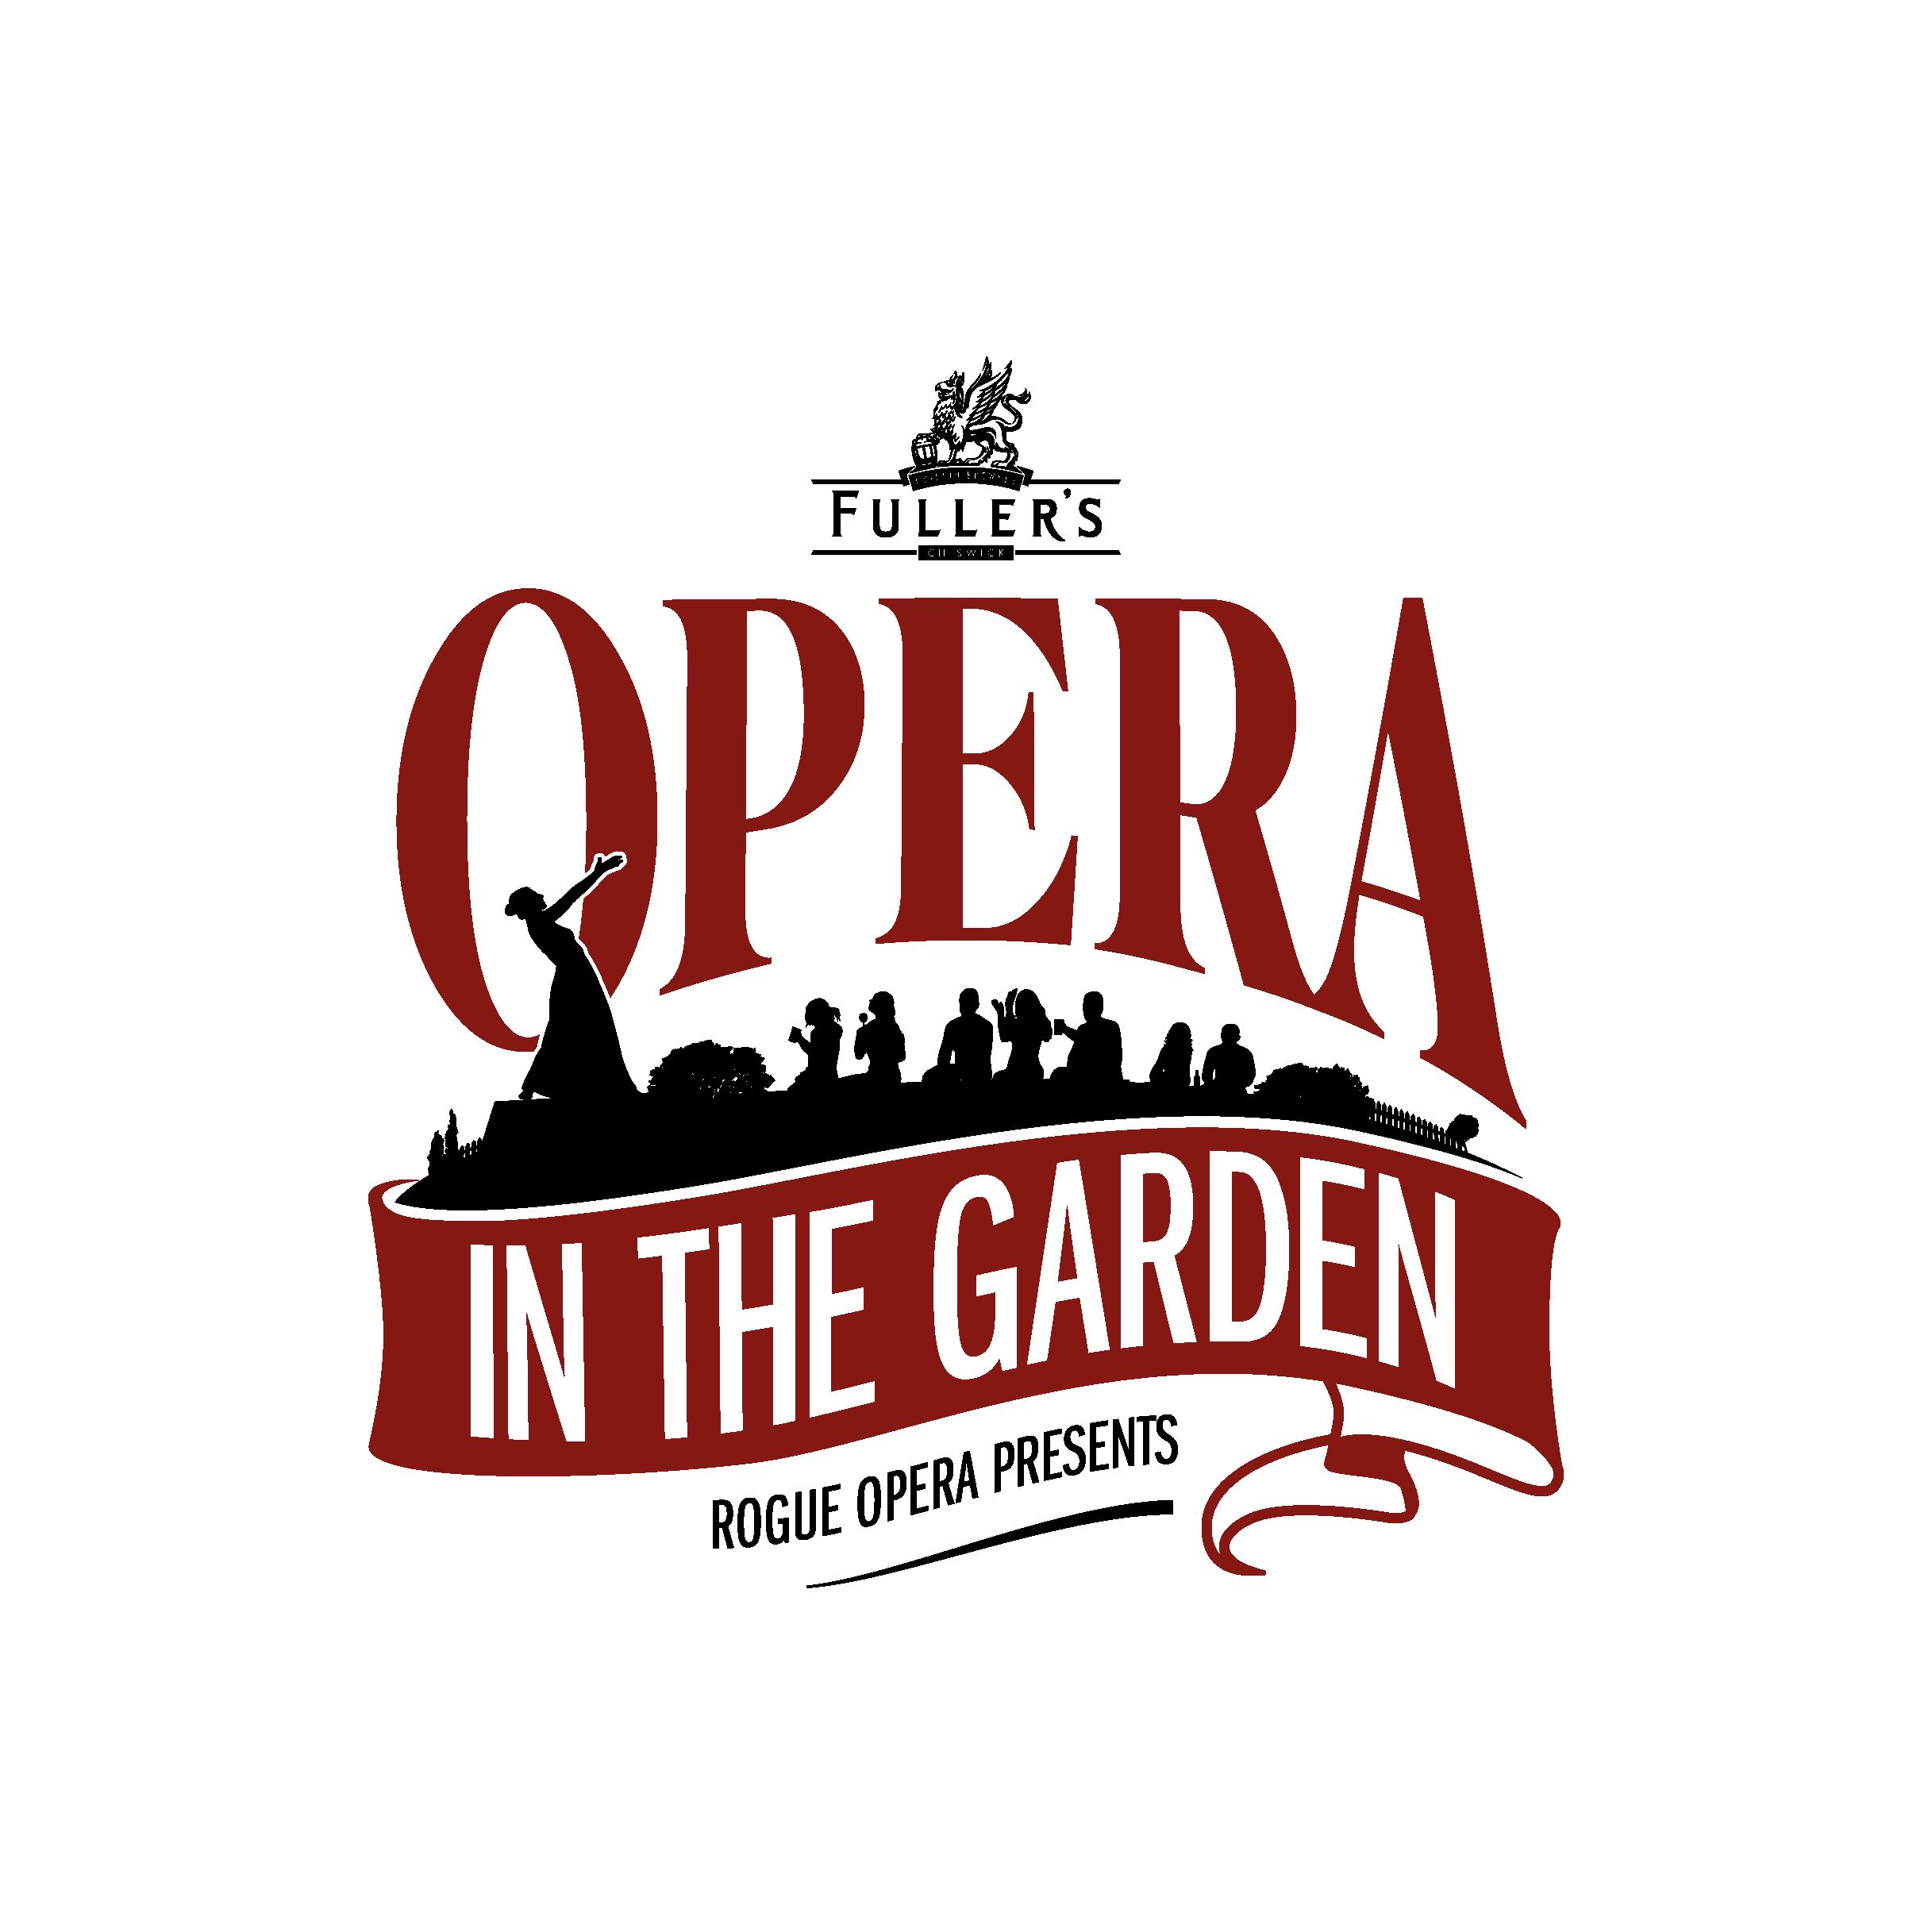 6722 Opera Logo_Master crowd red rogue